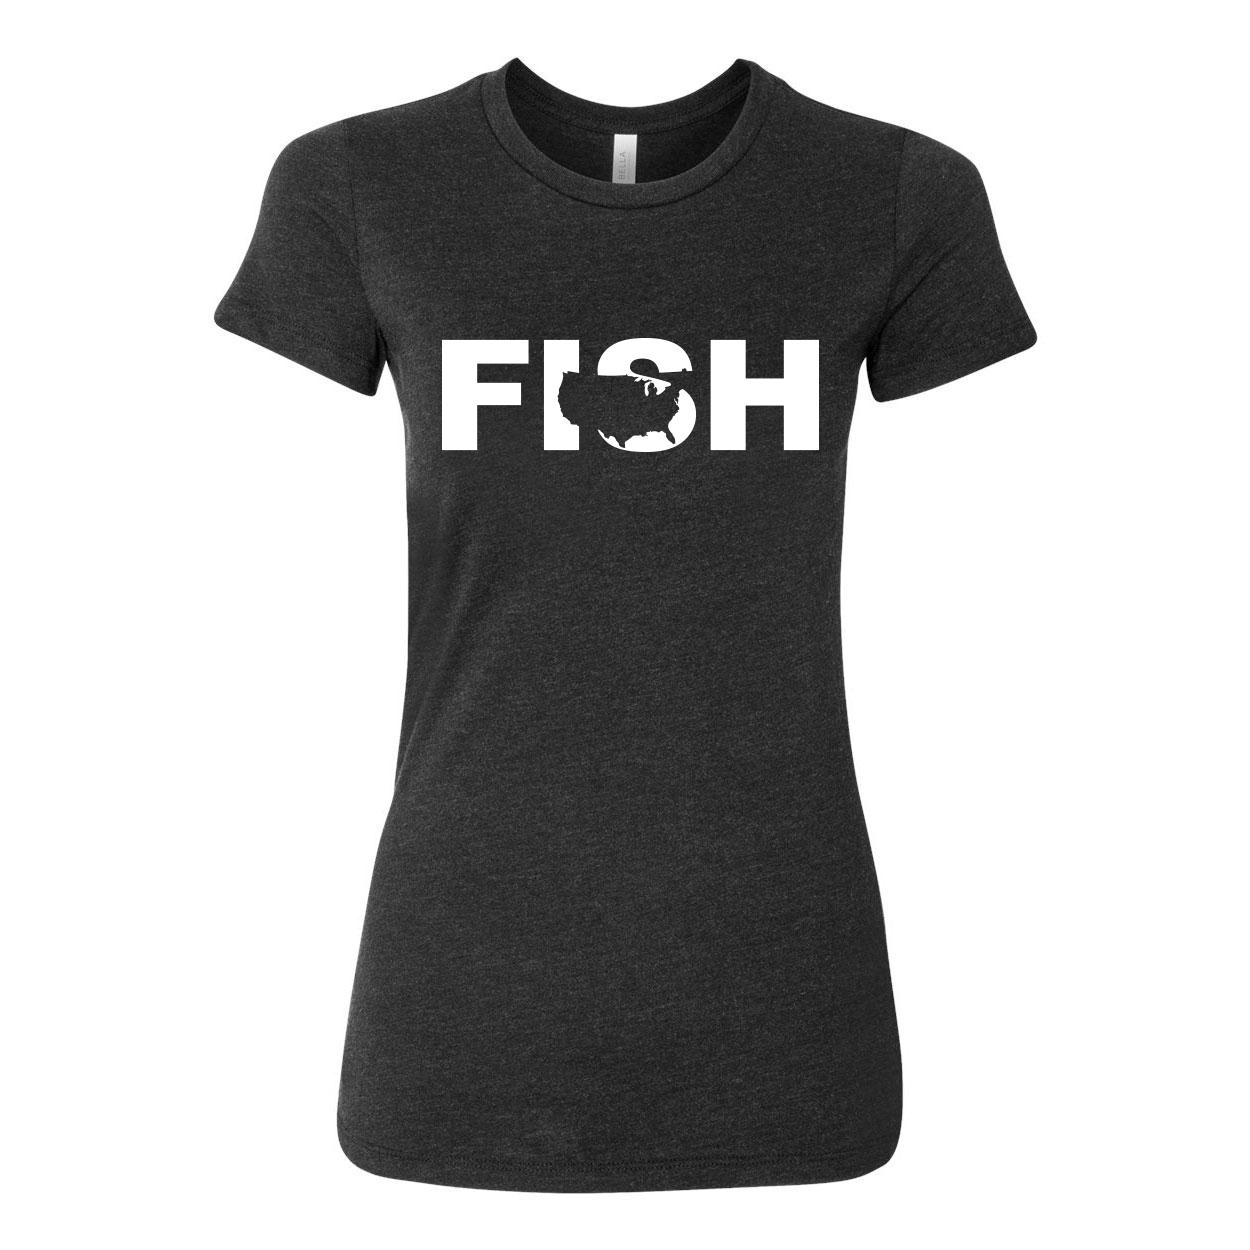 Fish United States Classic Women's Fitted Tri-Blend T-Shirt Dark Heather Gray (White Logo)